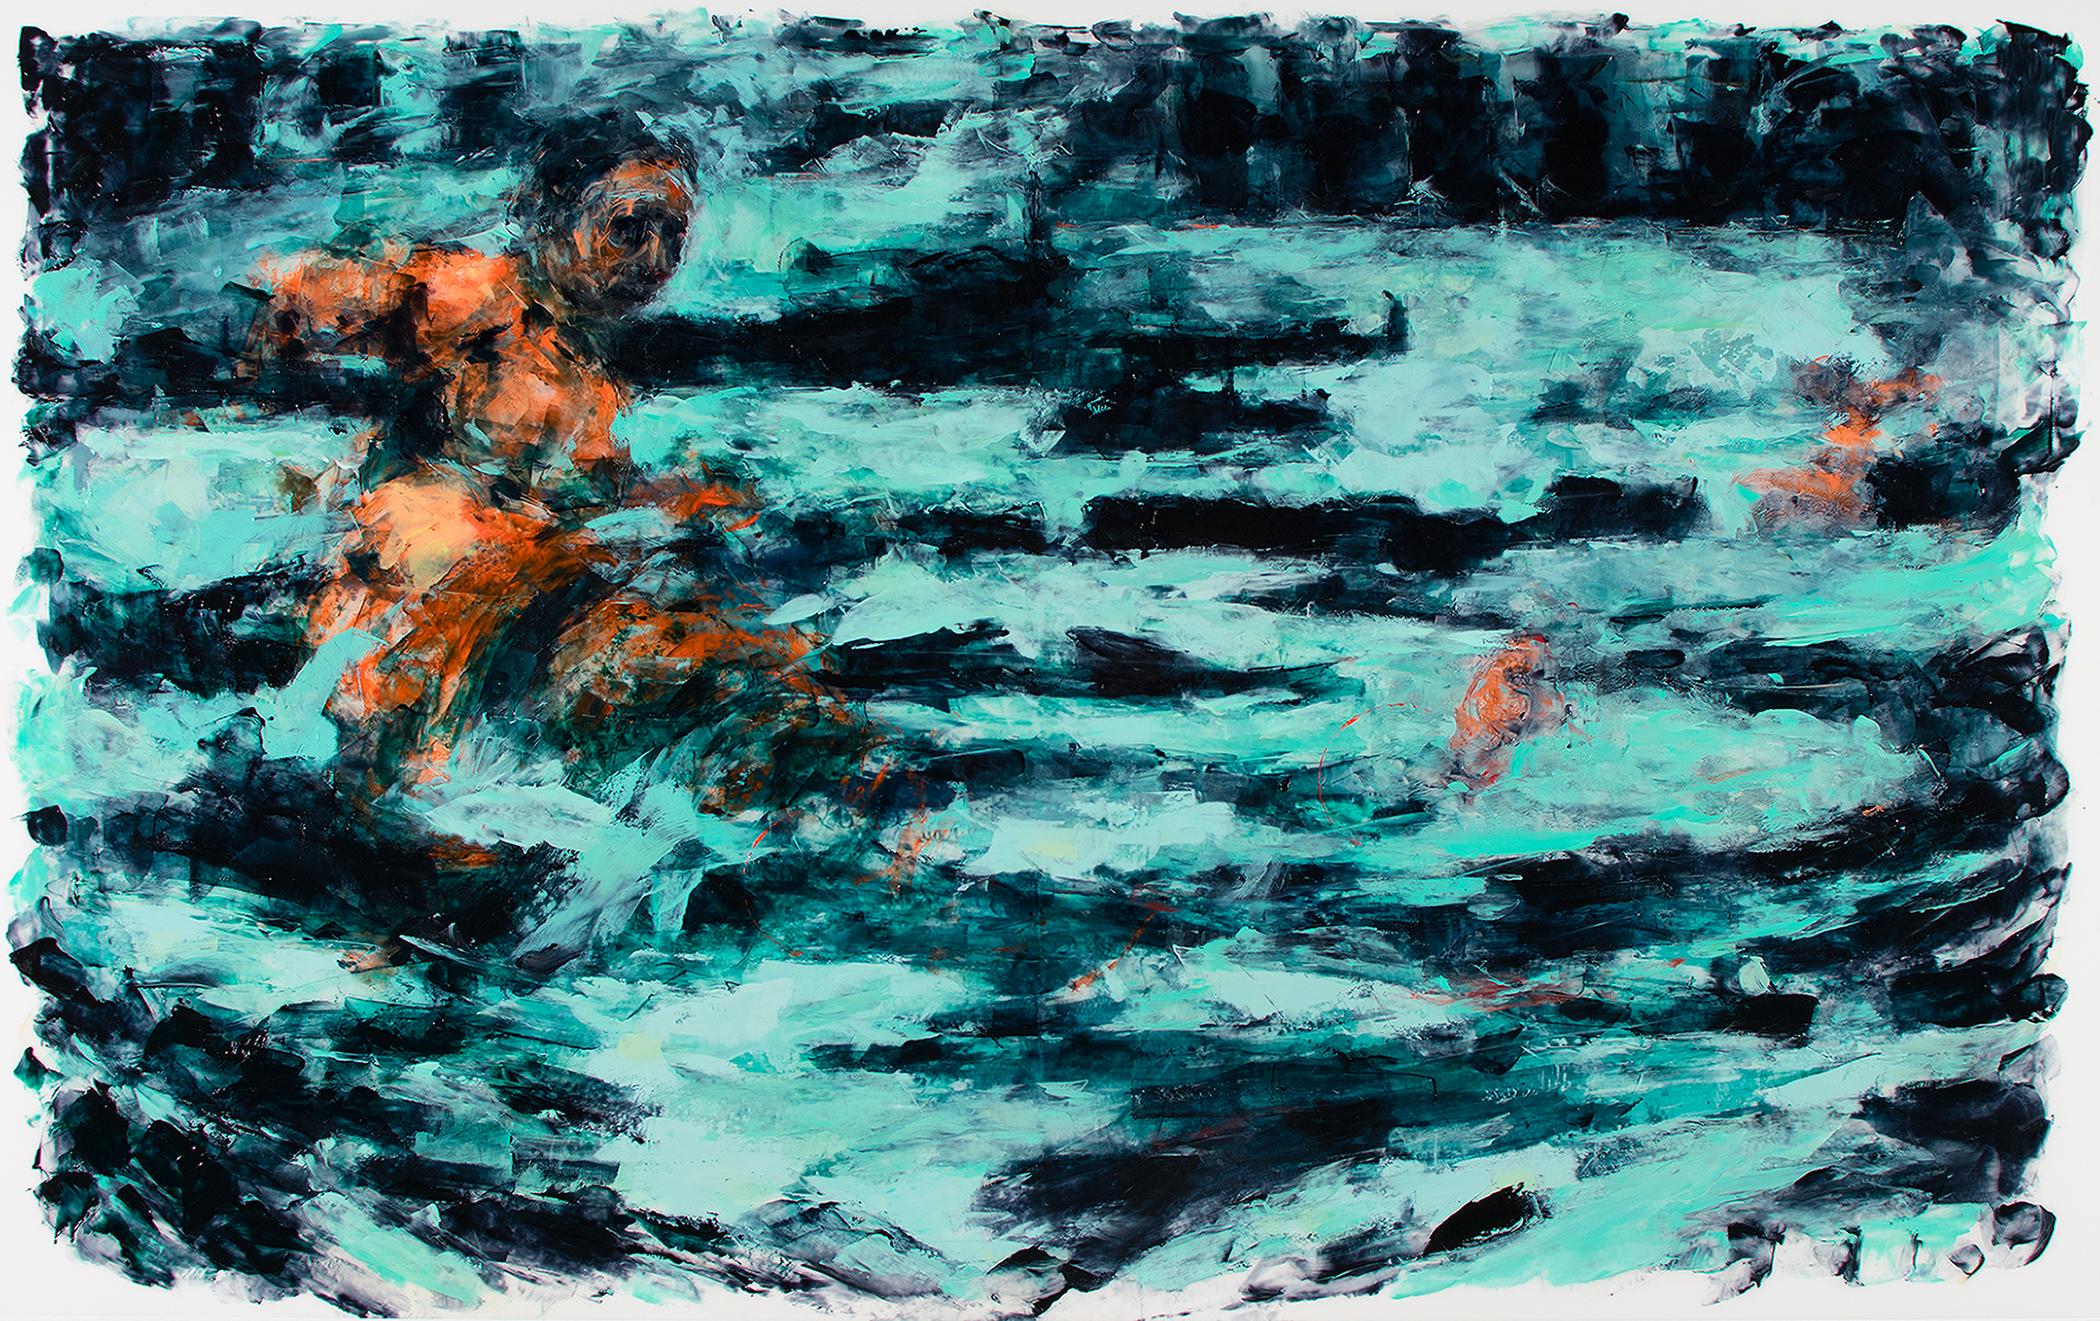 "'Residual Flow', oil, acrylic, and monotype on Mylar, 25"" x 40"", 2017"